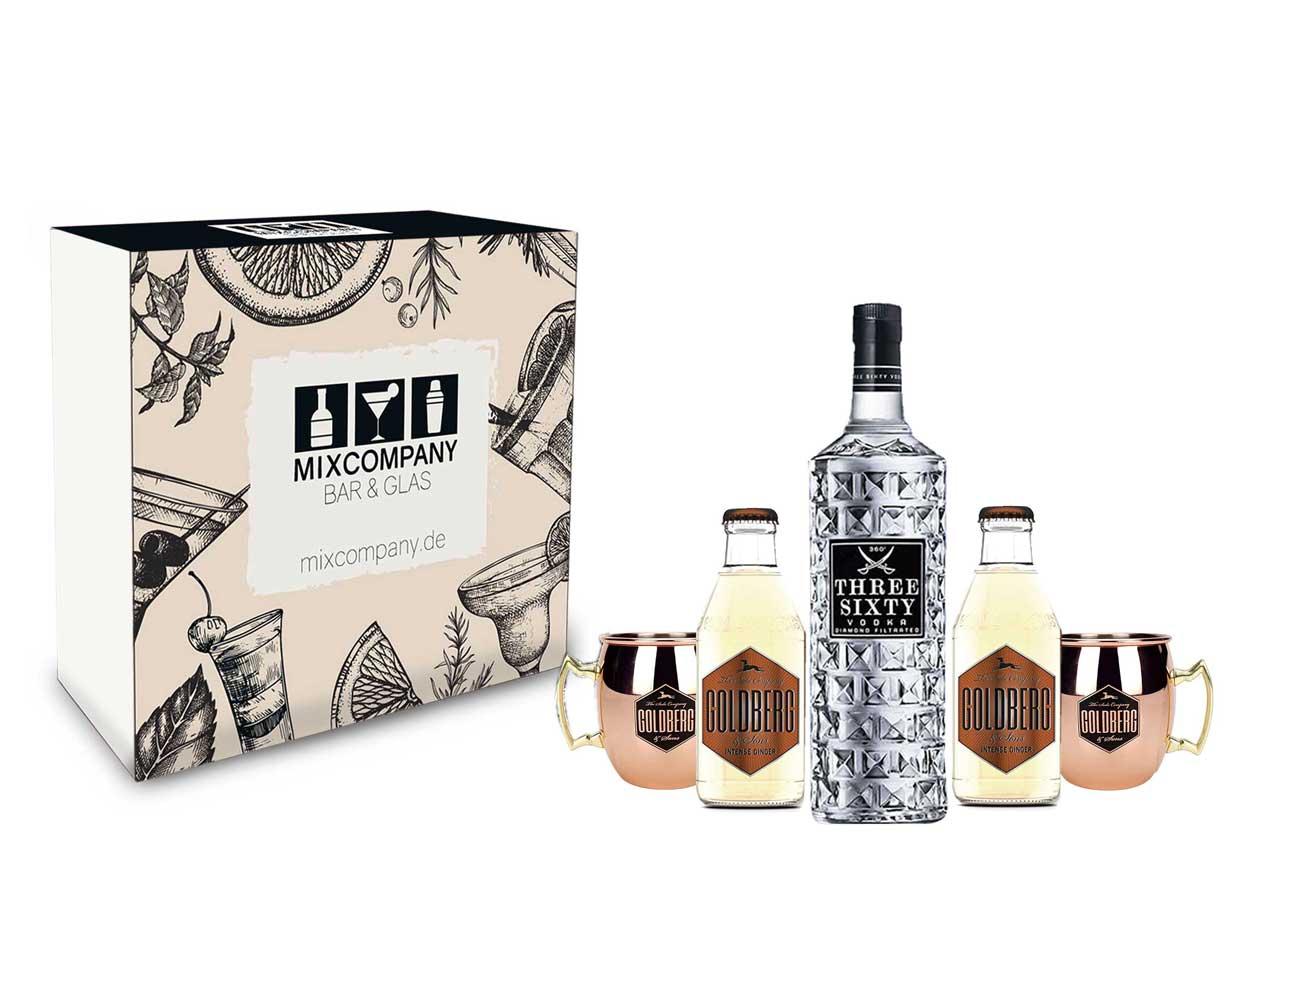 Moscow Mule Set / Geschenkset - Three Sixty Vodka 0,7l 700ml (37,5% Vol) + 2x Goldberg Kupferbecher + 2x Goldberg Intense Ginger 200ml - Inkl. Pfand MEHRWEG